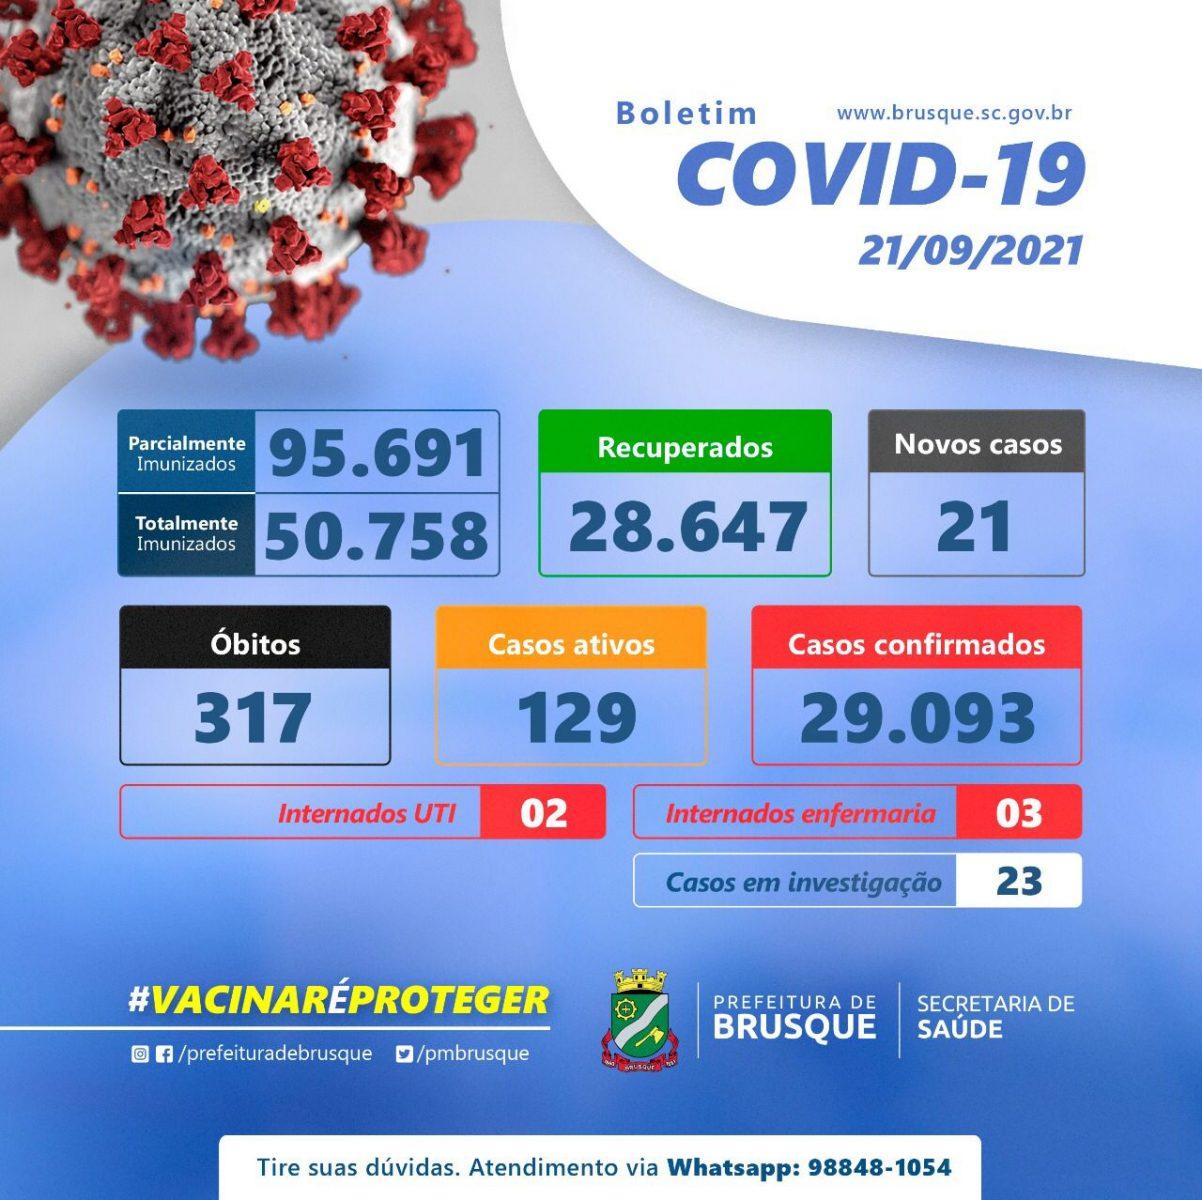 Covid-19: Confira o boletim epidemiológico desta terça-feira (21)